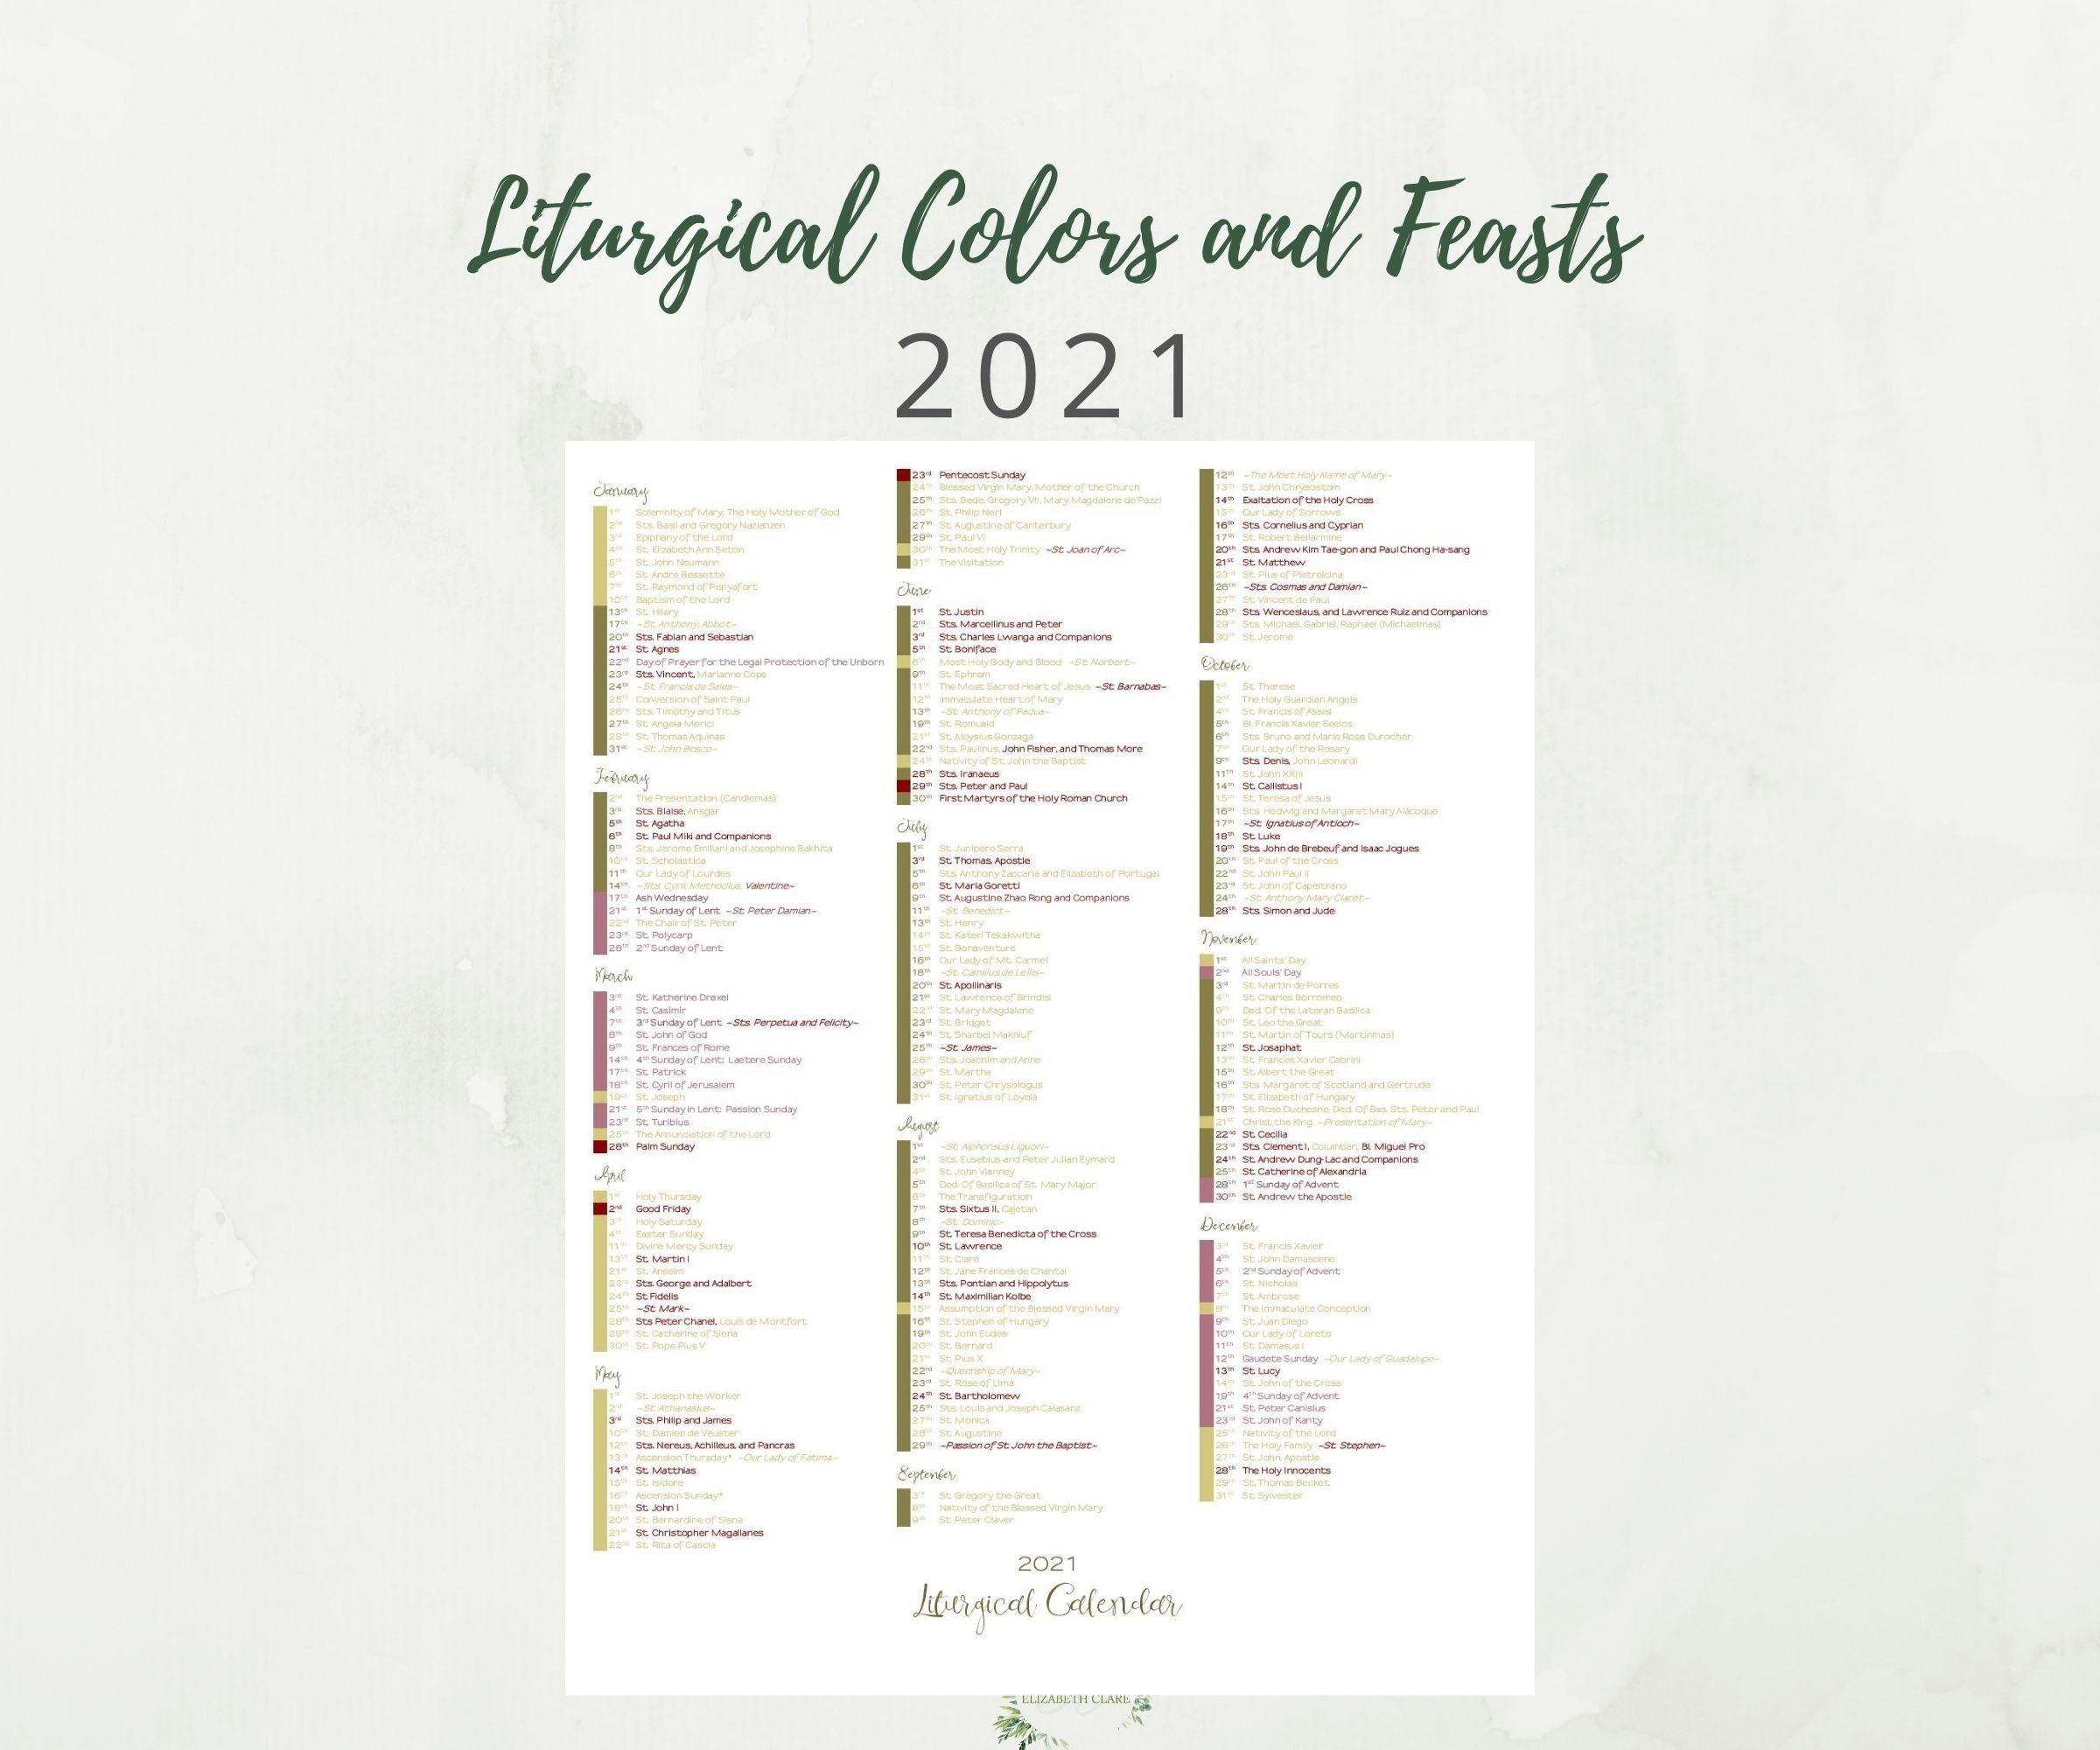 2021 At A Glance Catholic Liturgical Calendar-Catholic Church Year 2021